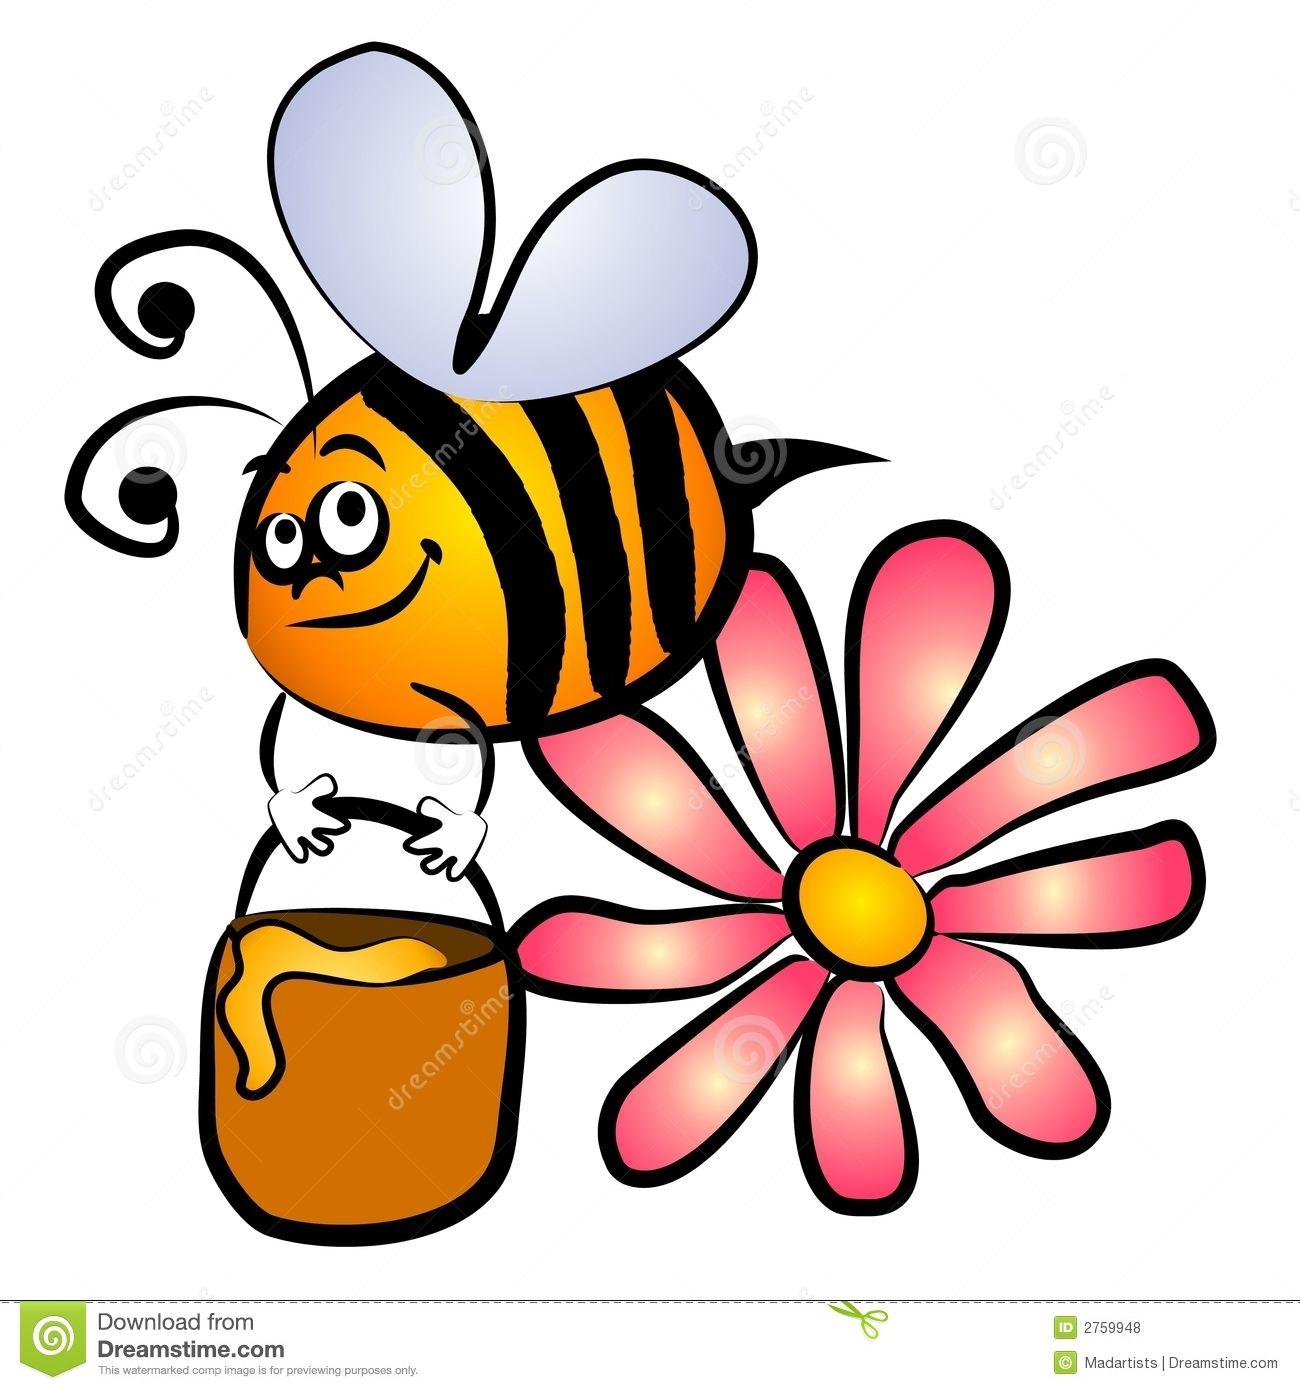 flying bumble bee clip art cartoon bumblebee flying with honey